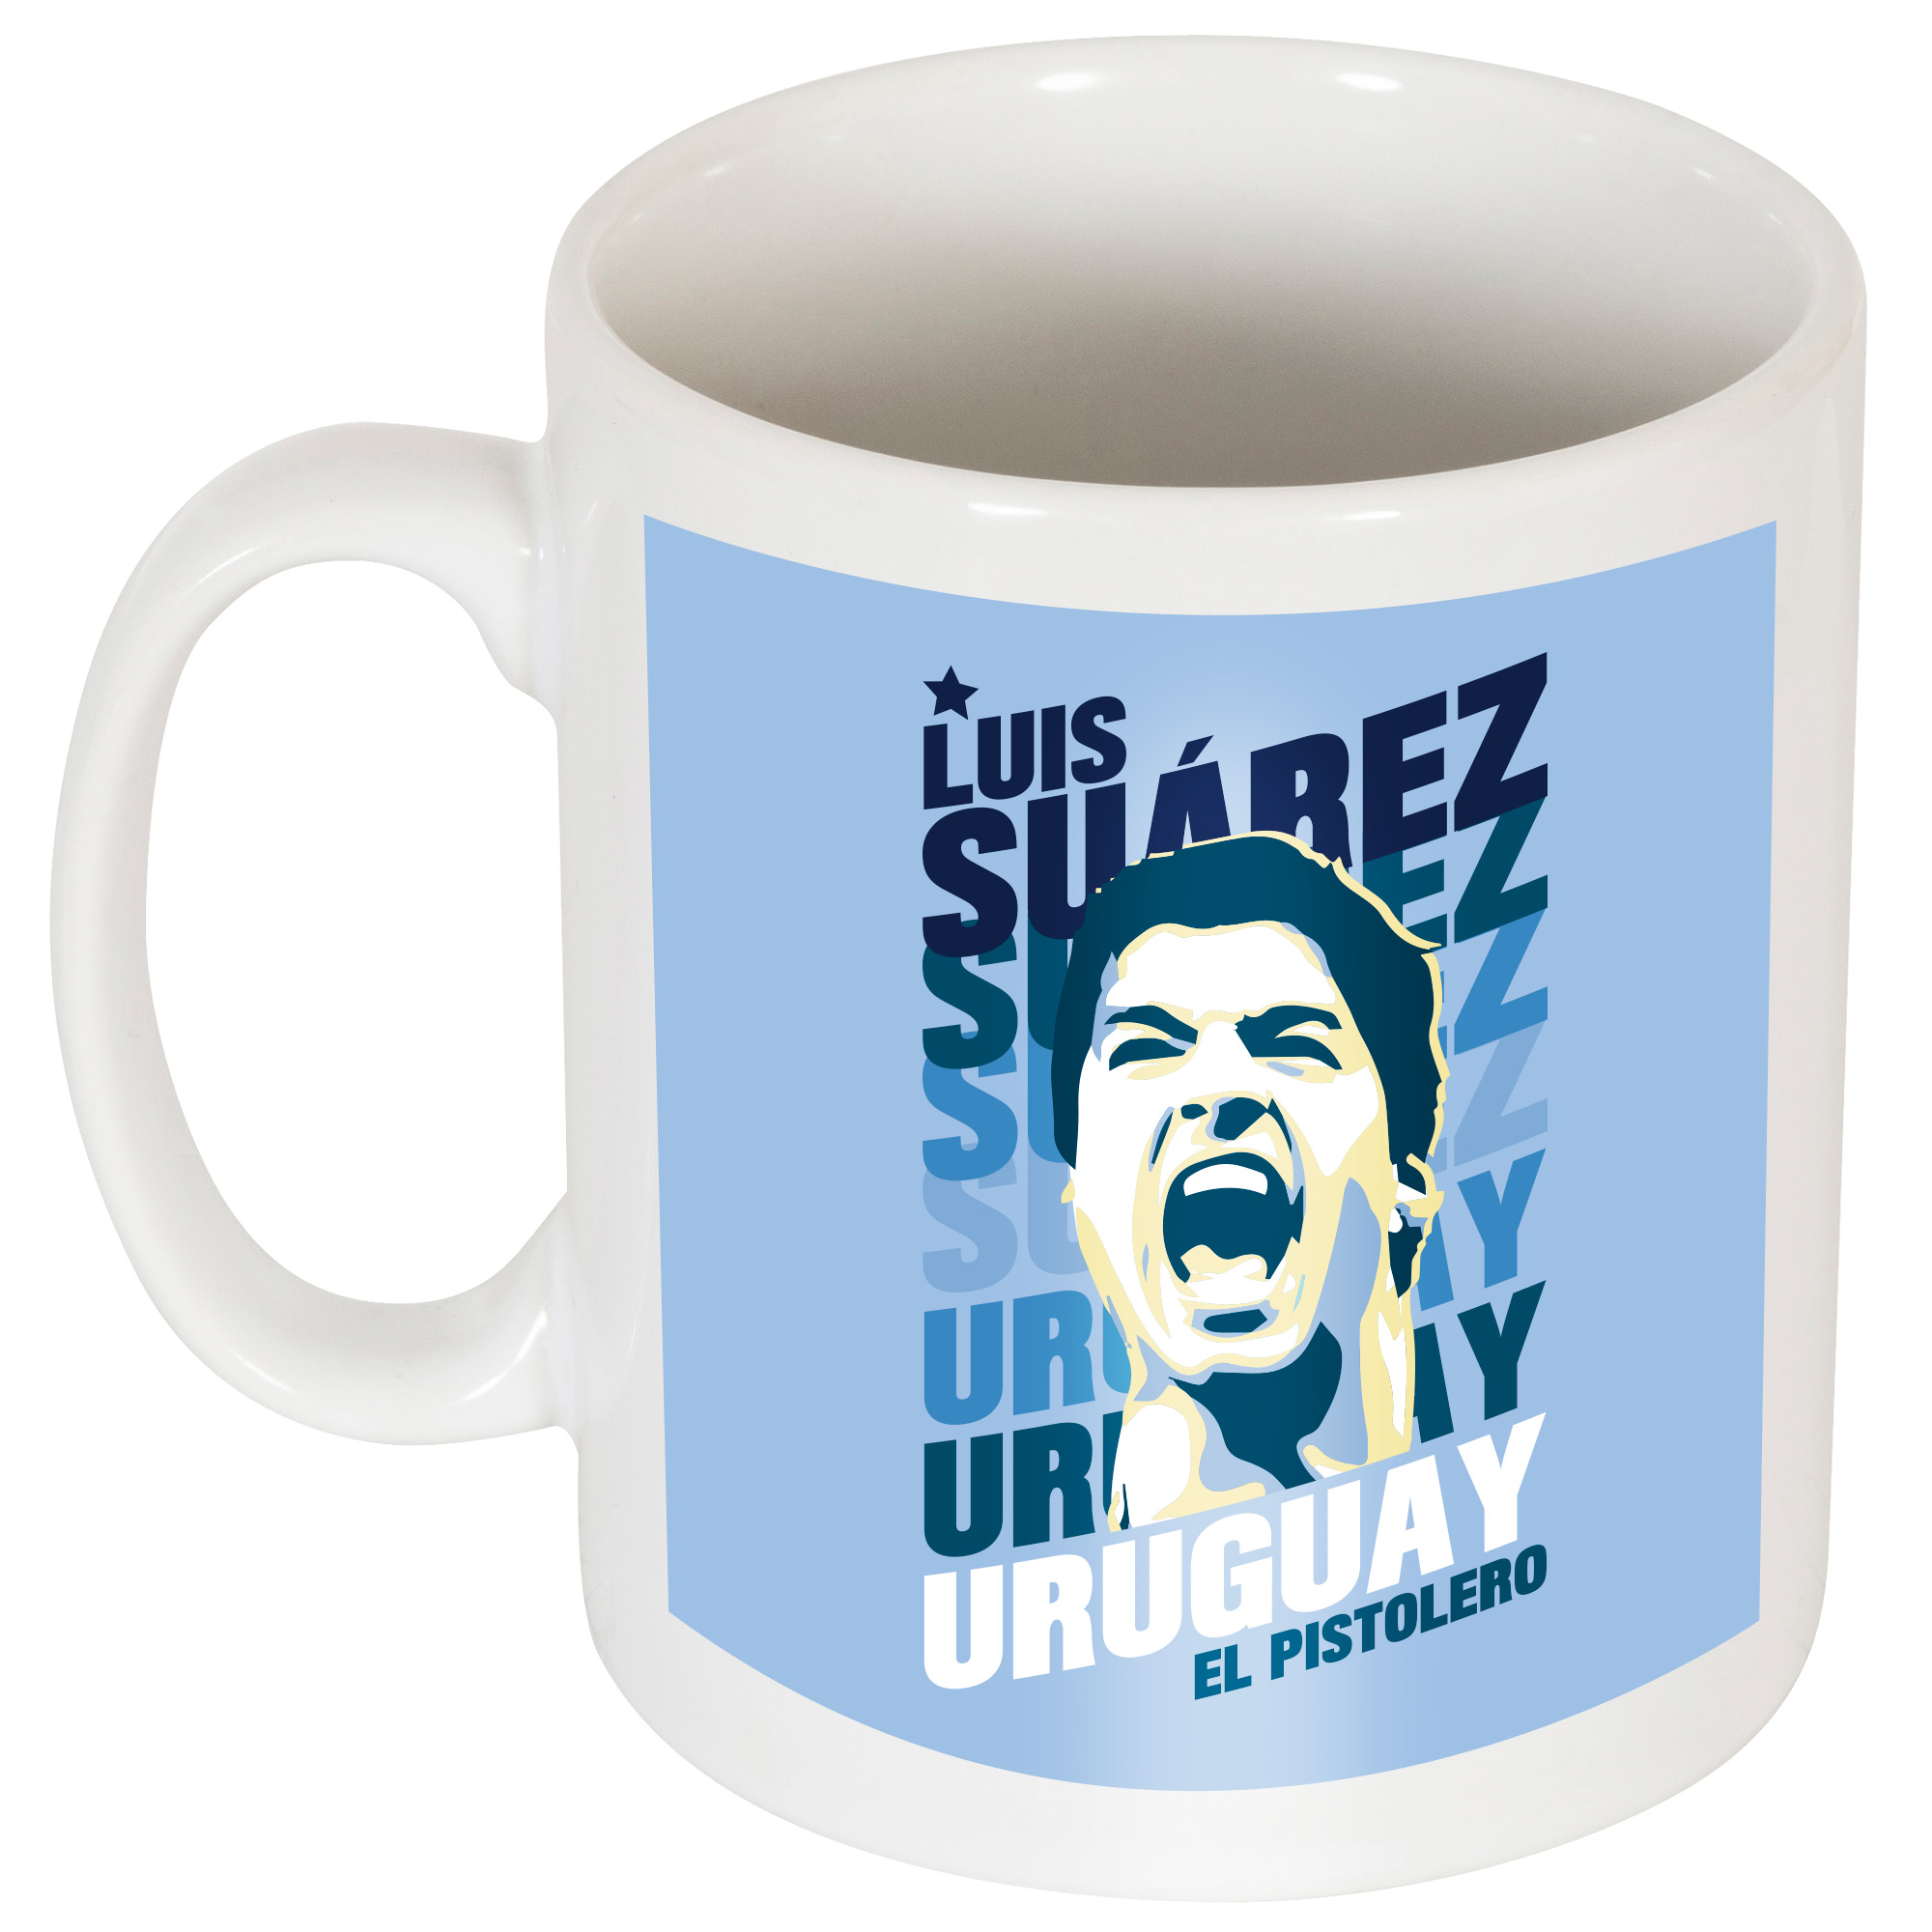 Suarez Uruguay Portrait Mok